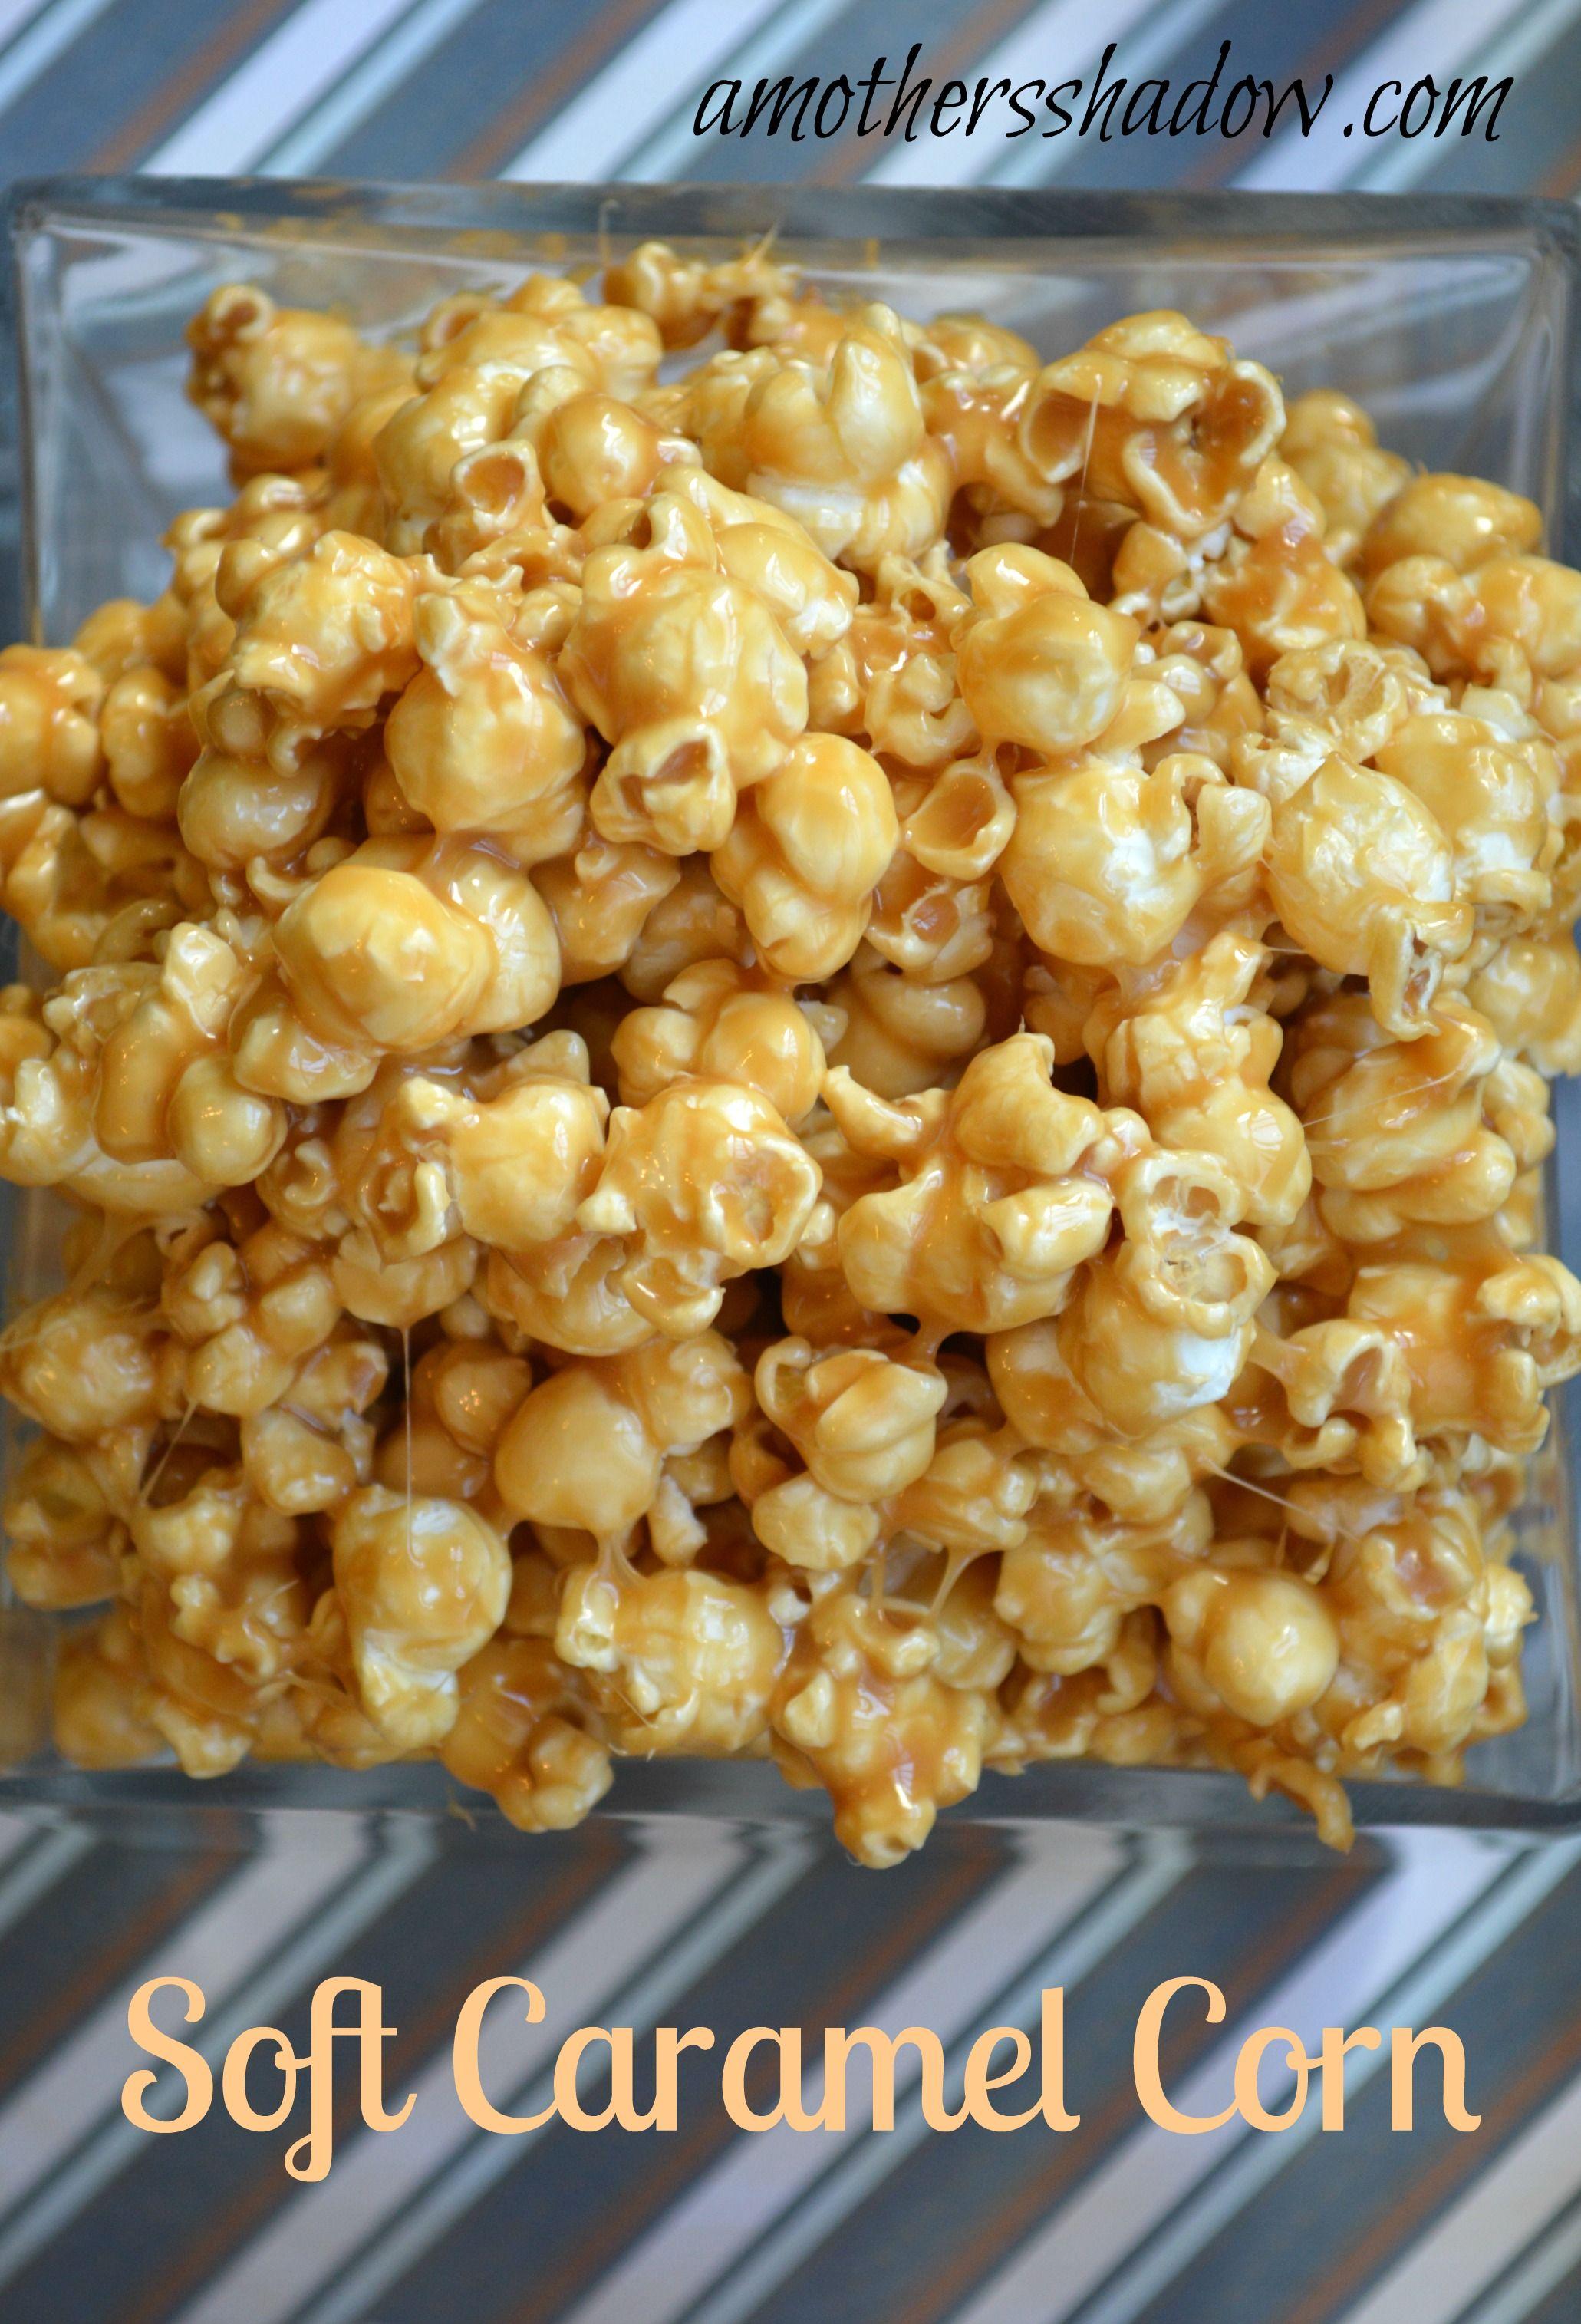 Soft And Creamy Caramel Corn Recipe Caramel Corn Popcorn Recipes Caramel Soft Caramel Popcorn